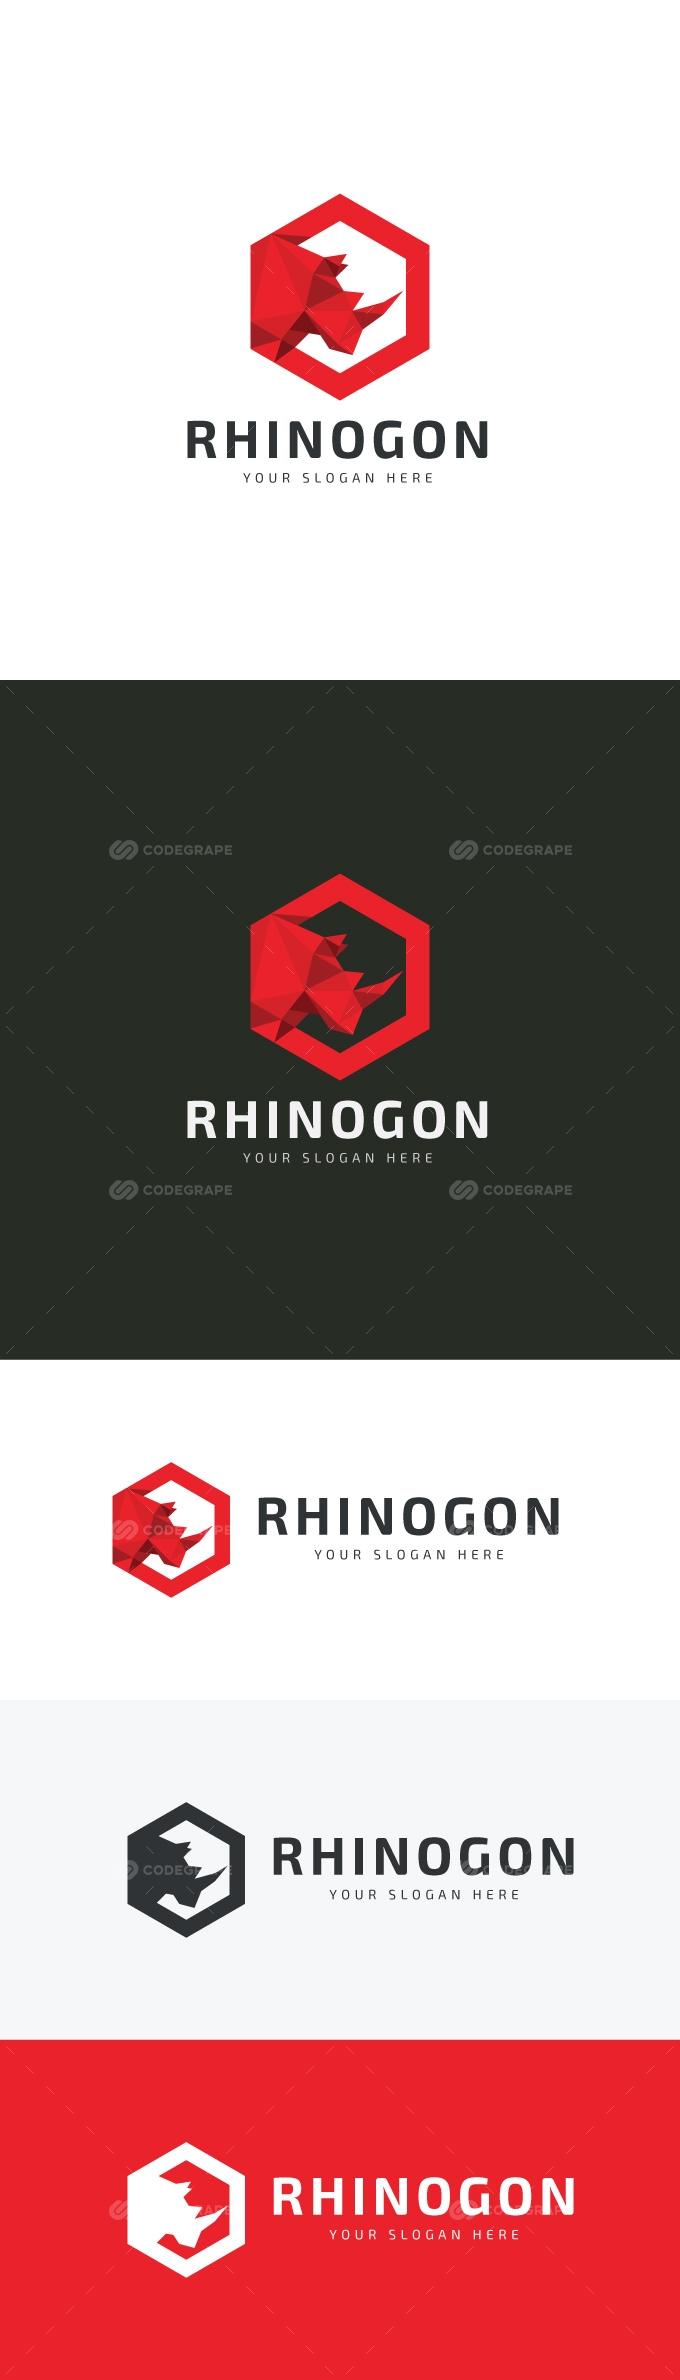 Rhino Hexagonal Logo